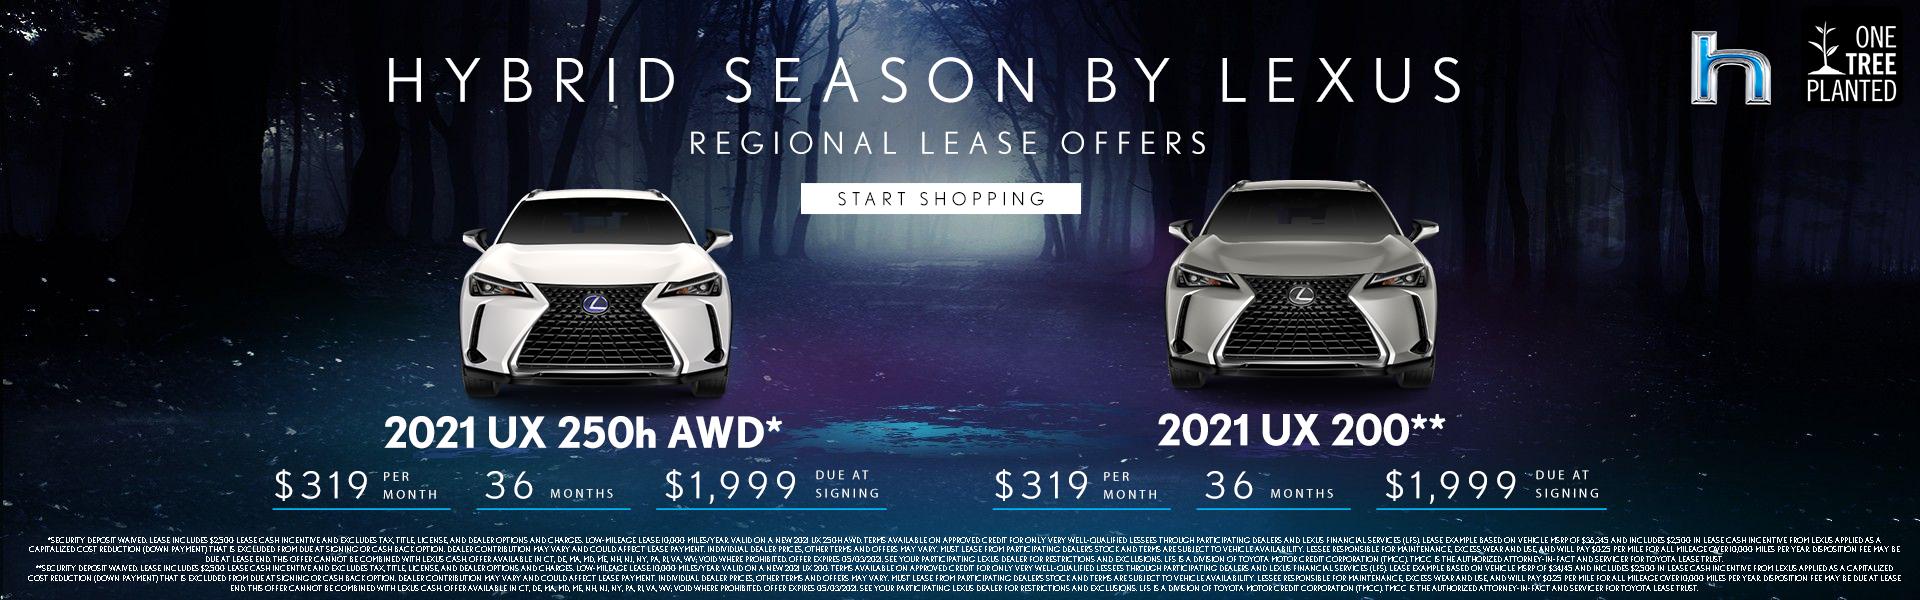 2021 UX 250h AWD $319